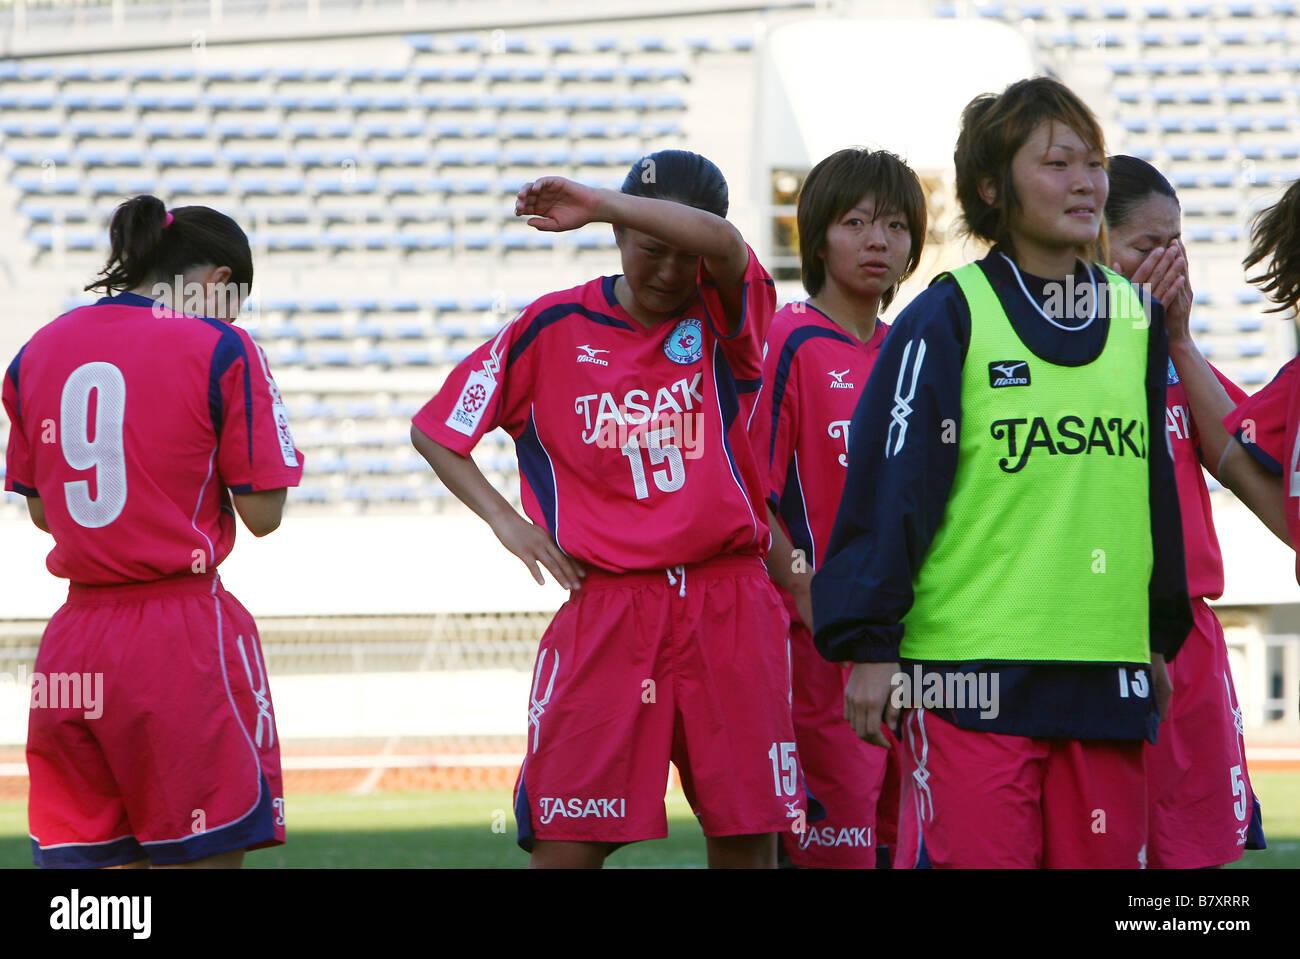 Tasaki Perule team group NOVEMBER 23 2008 Football 2008 NADESHIKO League Division 1 between NTV Beleza 4 1 TASAKI - Stock Image